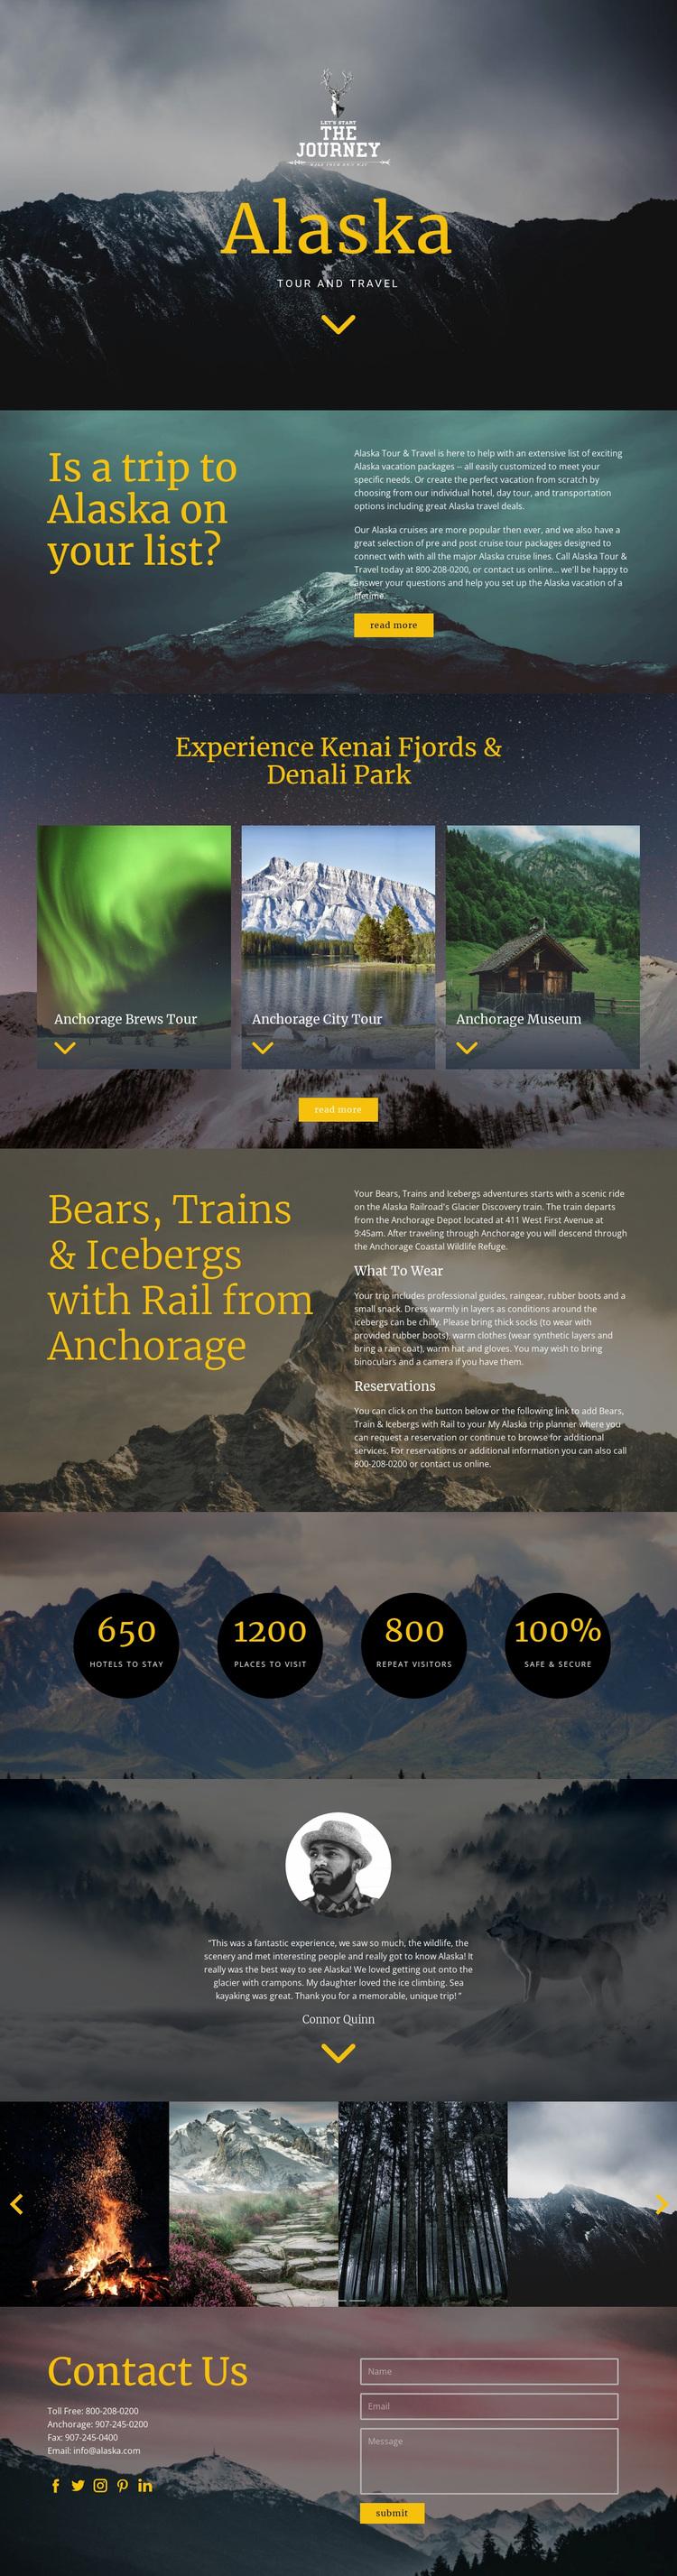 Alaska Travel Website Design